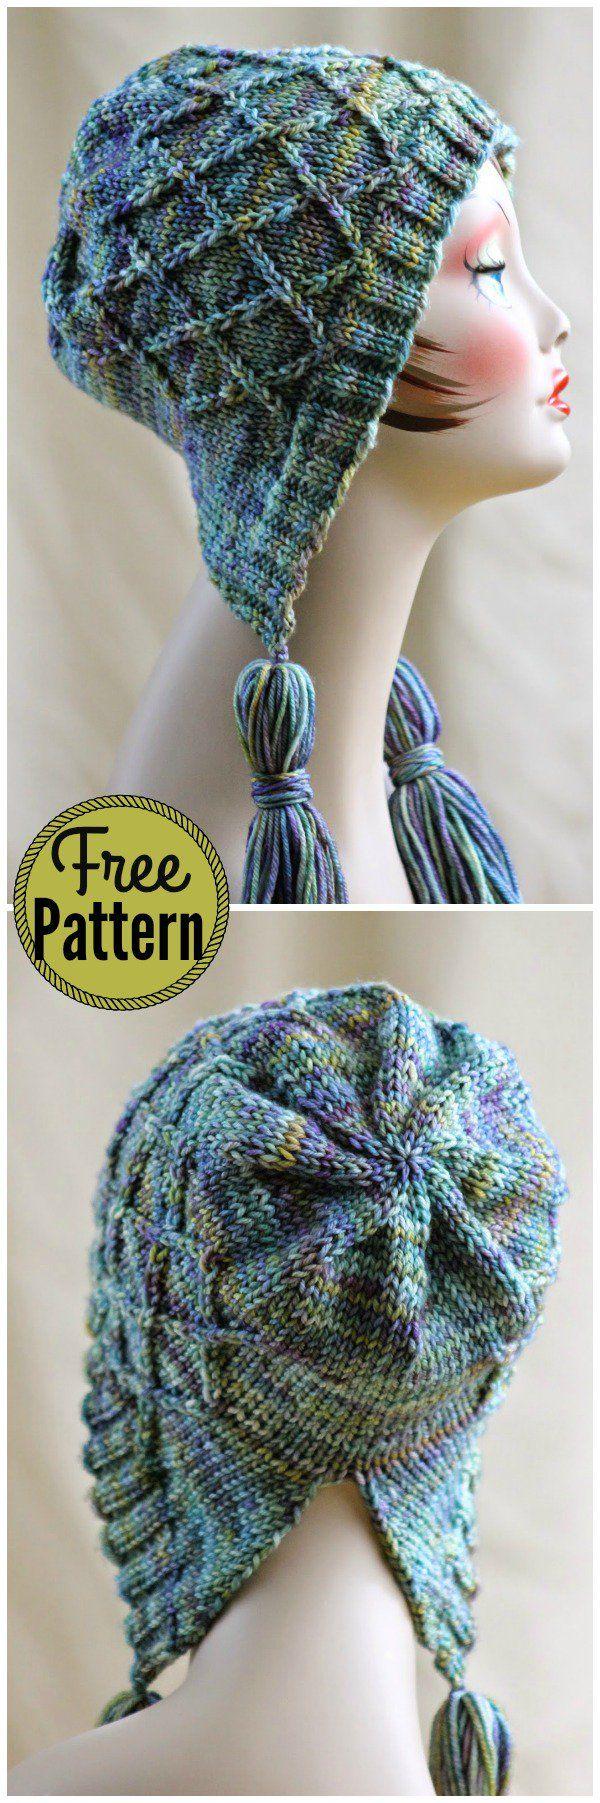 Iris Bloom Bonnet Free Knitting Pattern